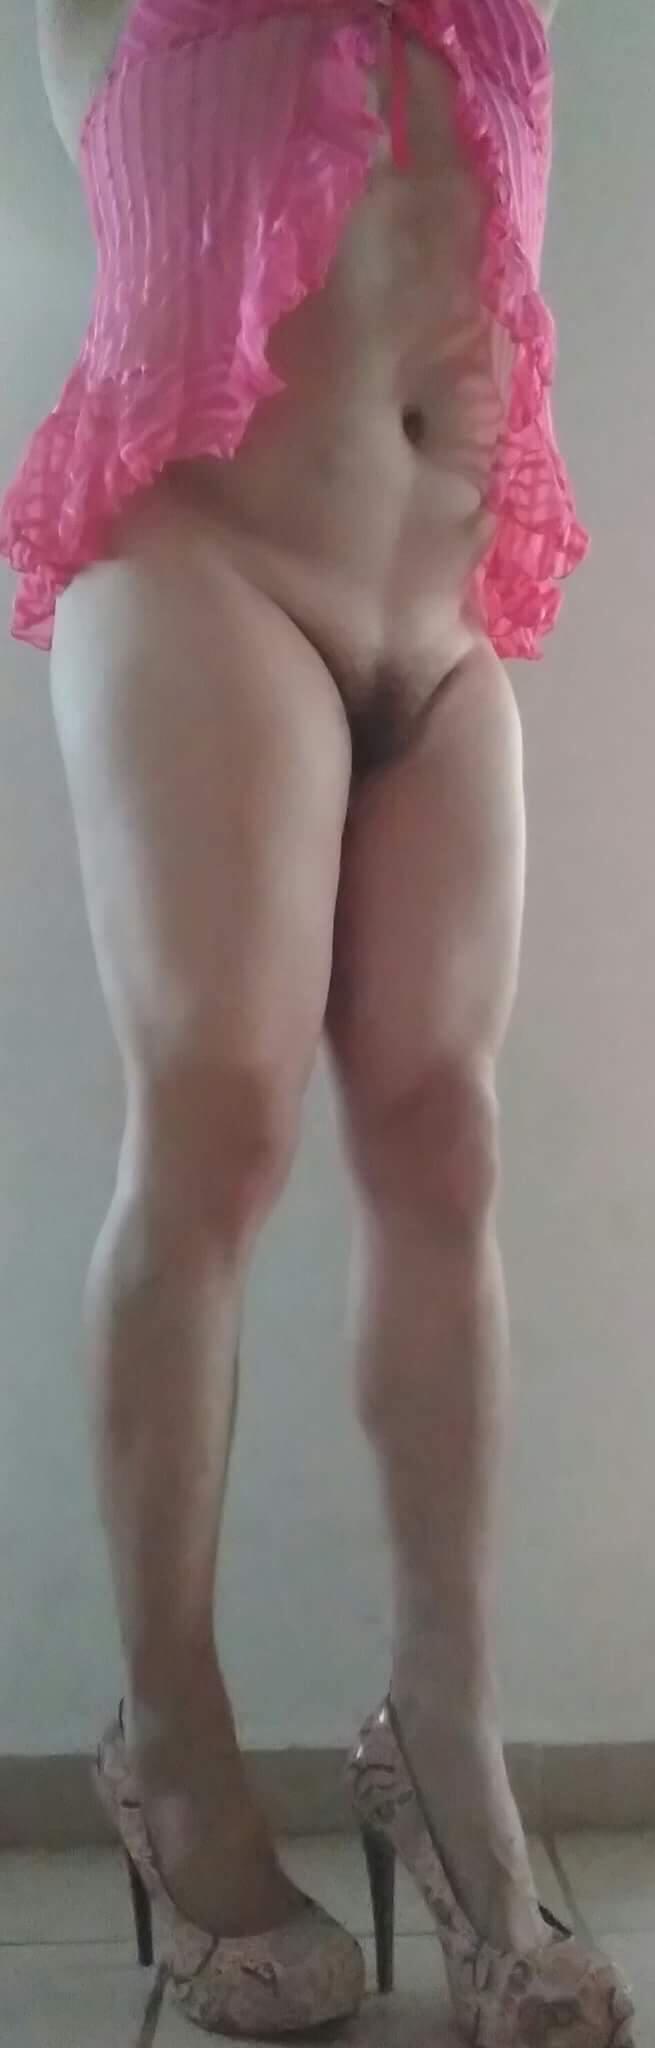 crossdresser mexicana